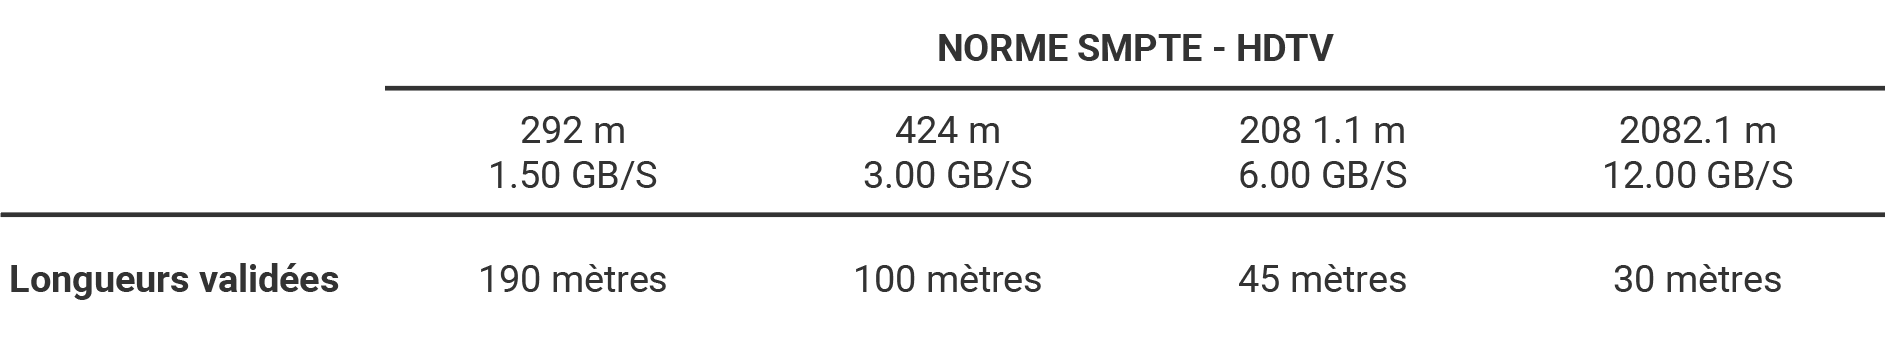 NORME SMPTE - HDTV